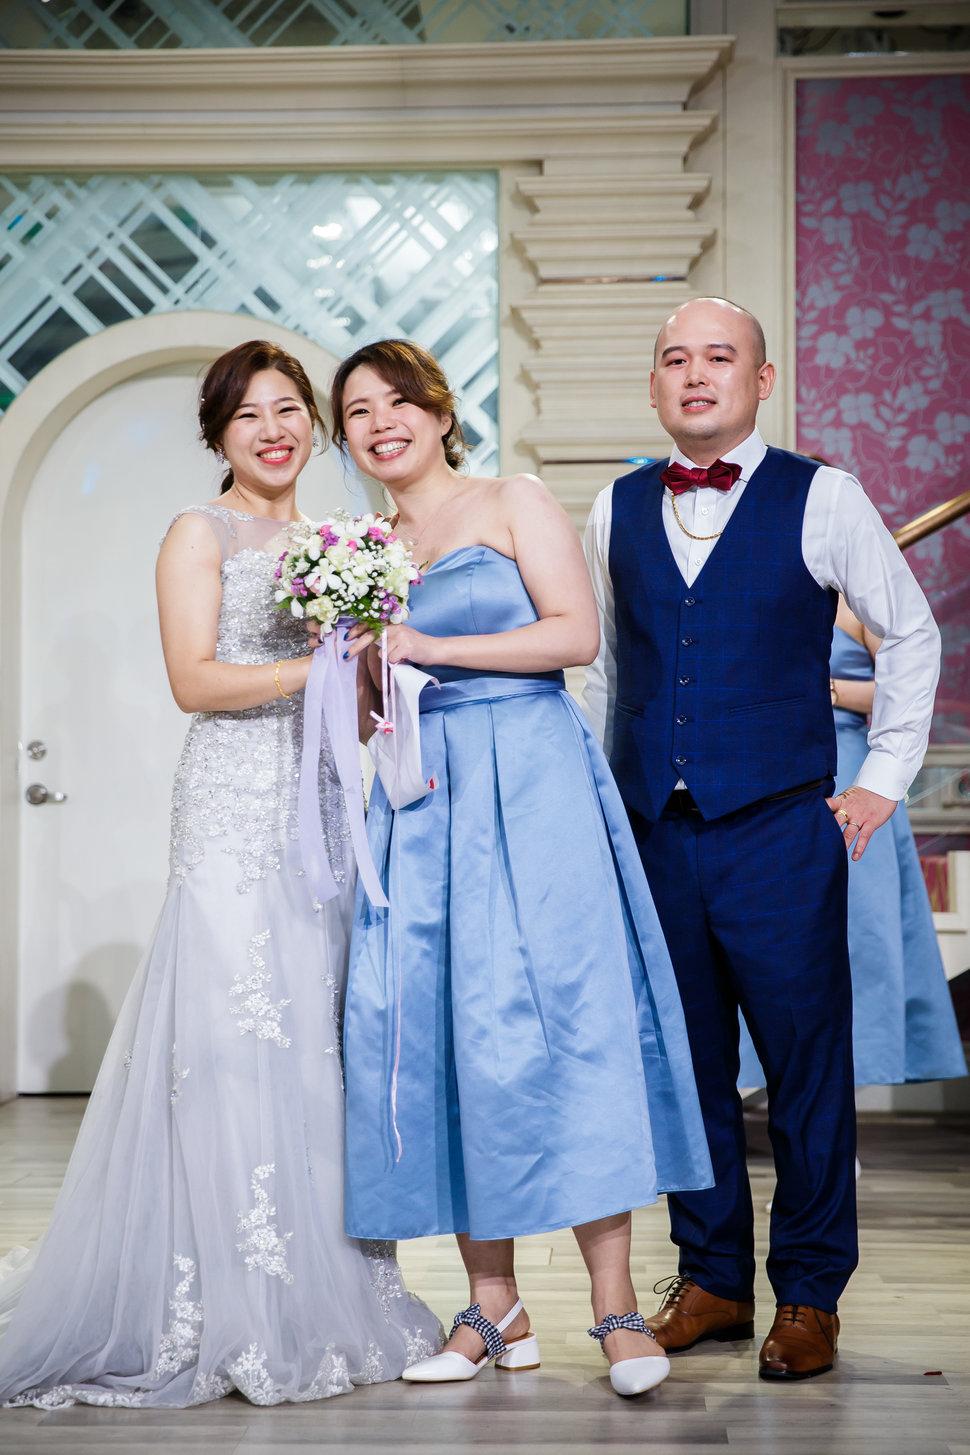 wedding-675 - J-Love 婚禮攝影團隊《結婚吧》